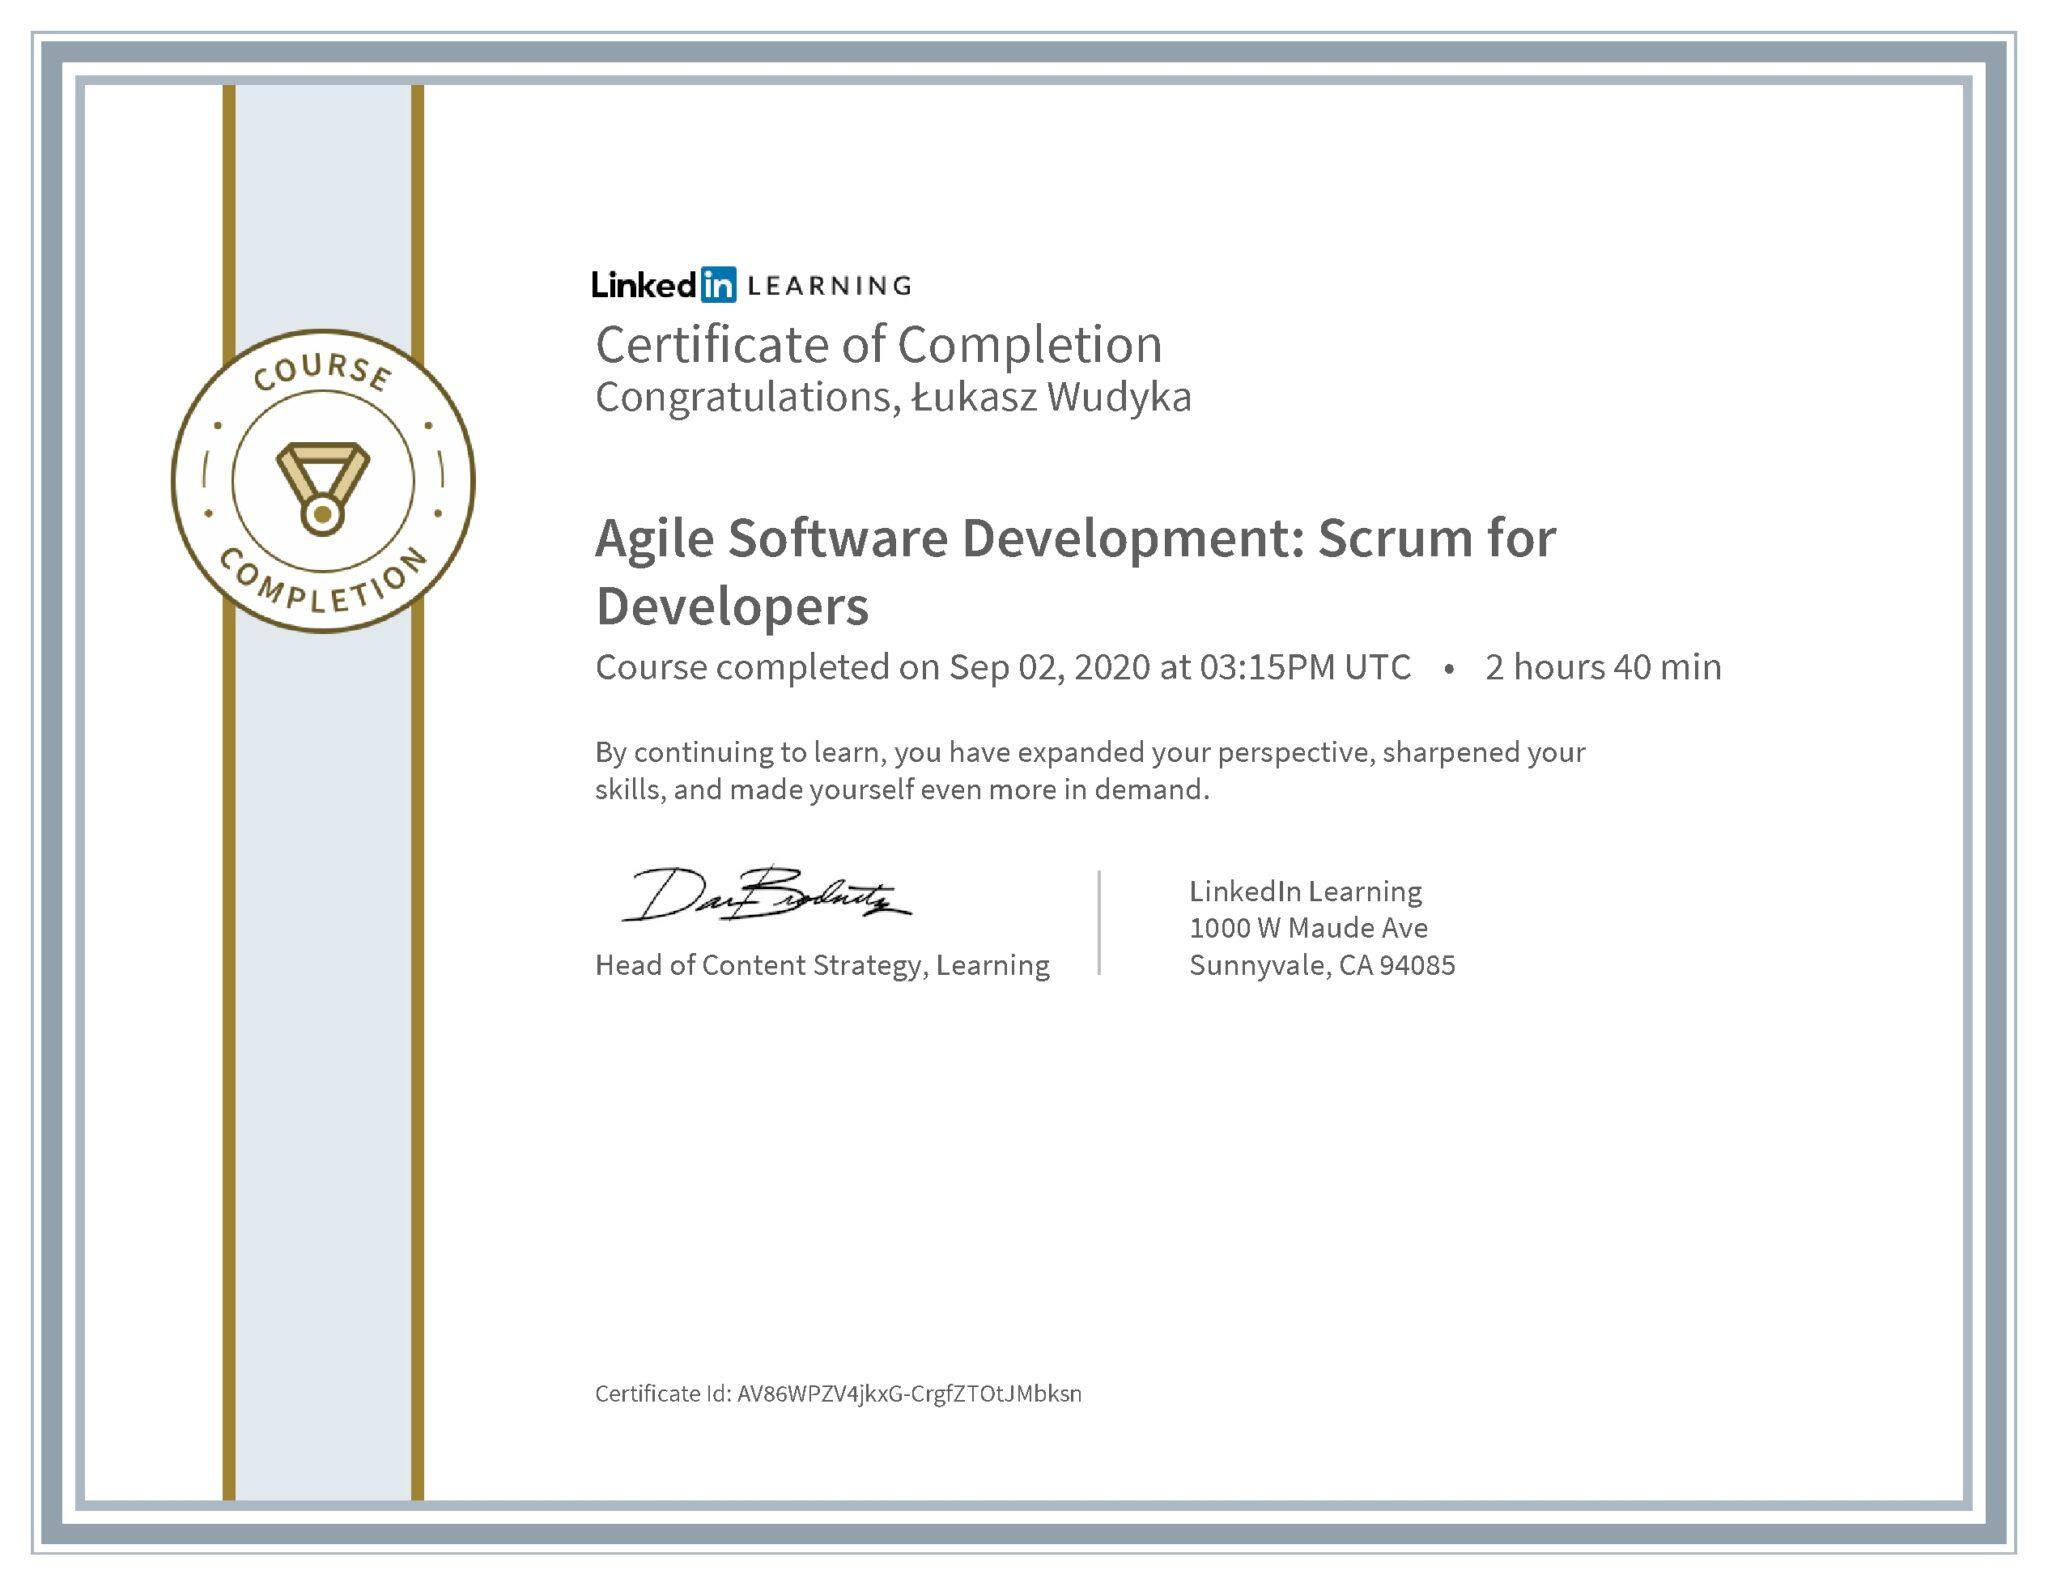 Łukasz Wudyka certyfikat LinkedIn Agile Software Development: Scrum for Developers